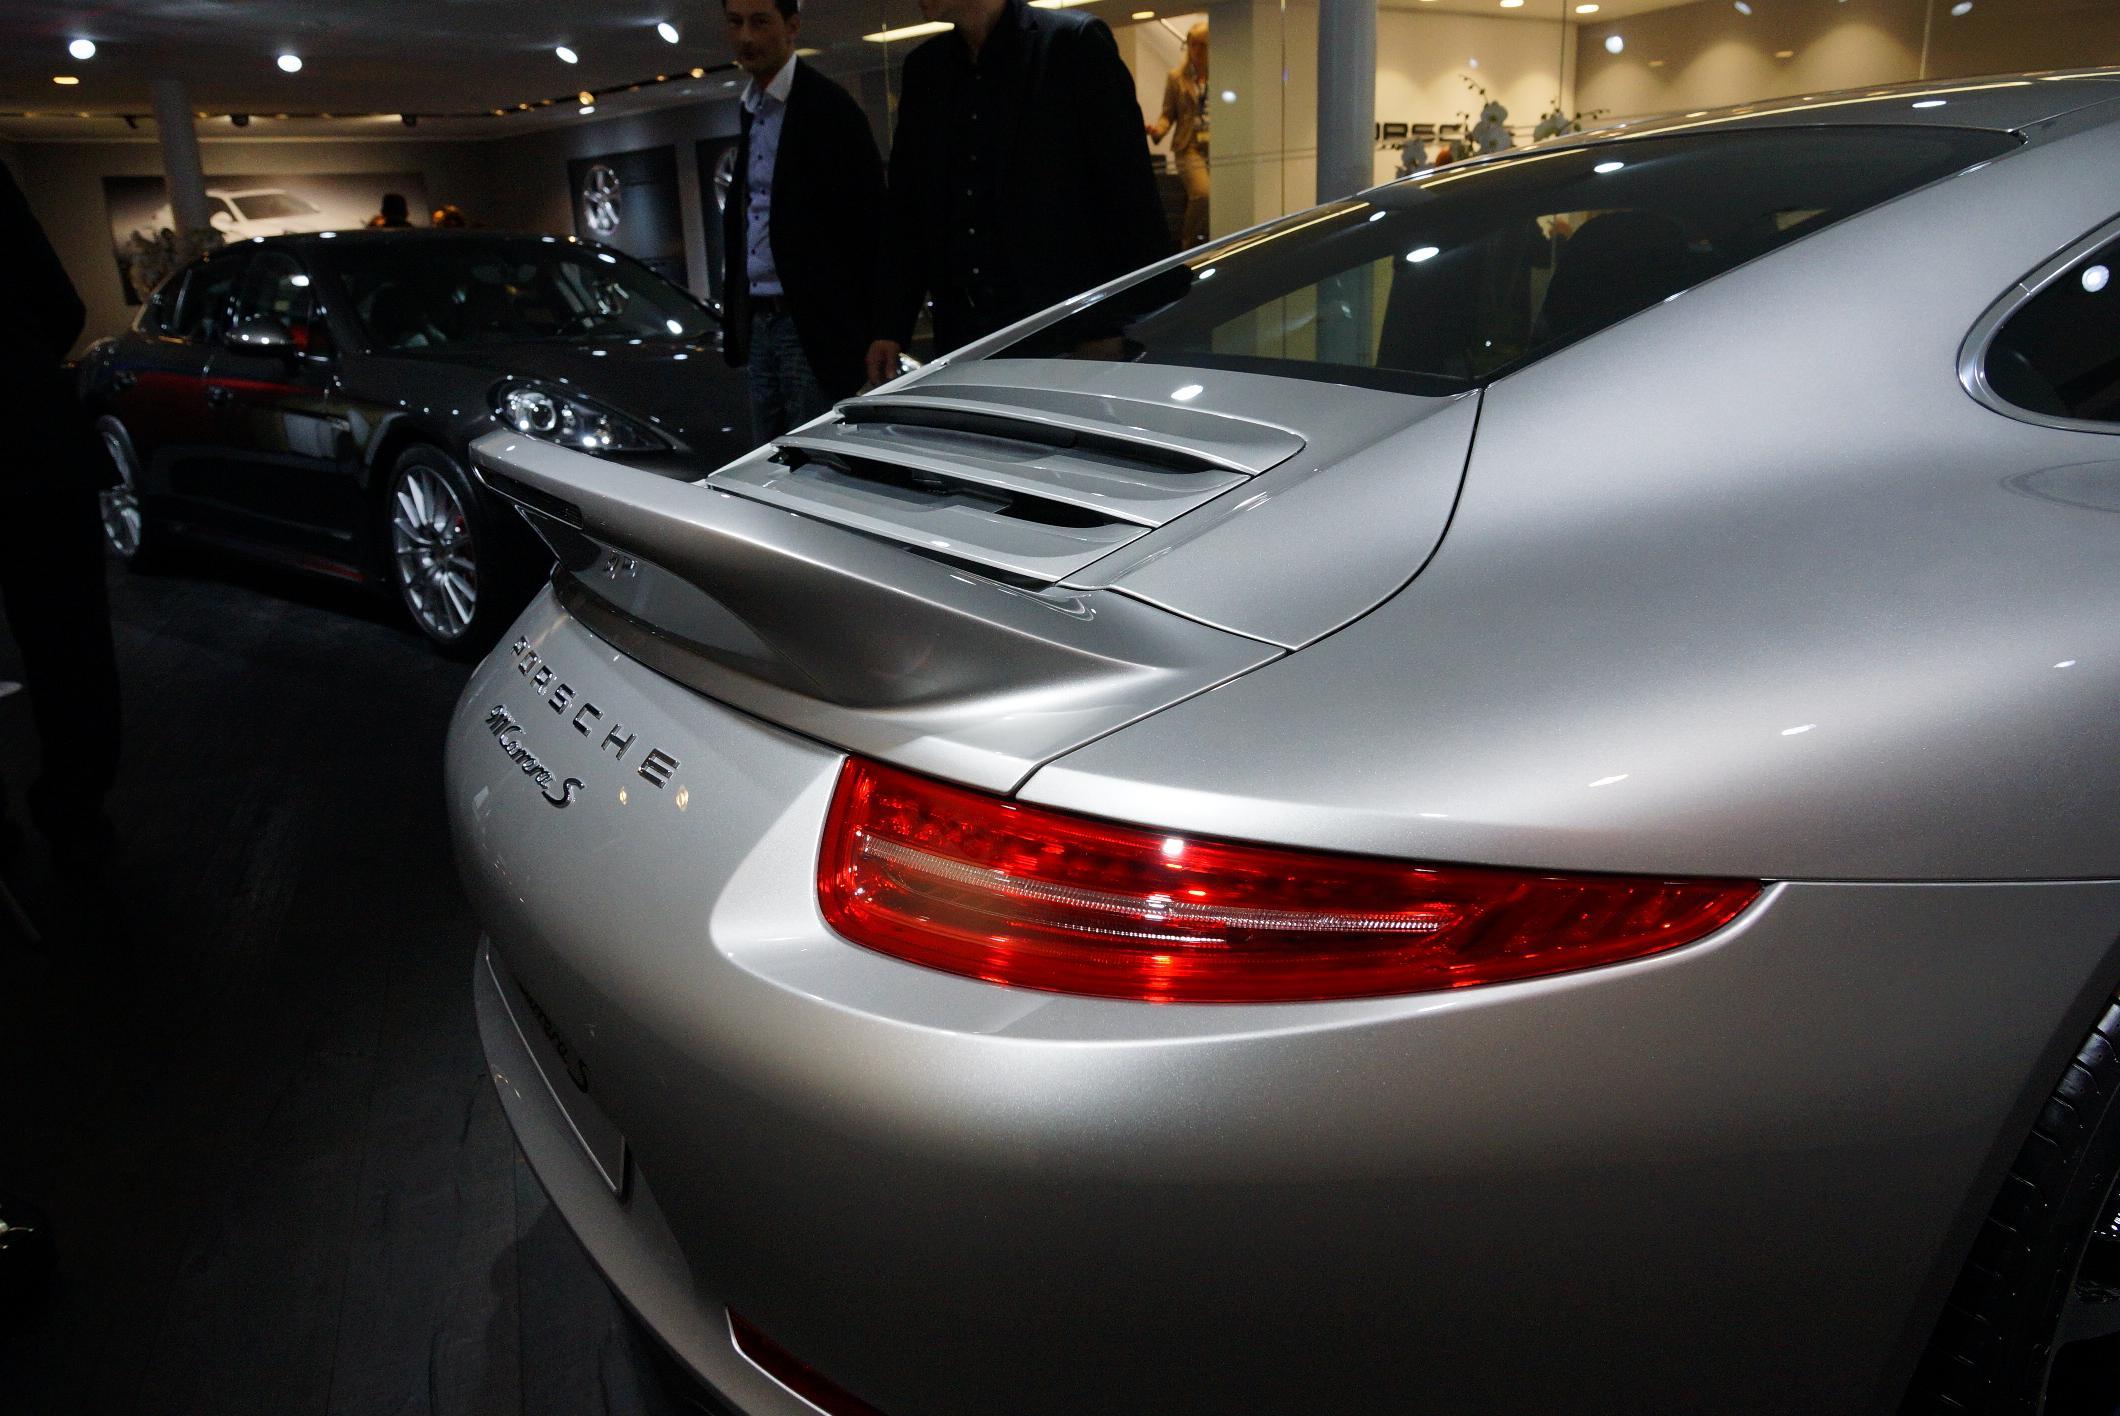 Porsche 911 Carrera S Rear Light Geneva 2012